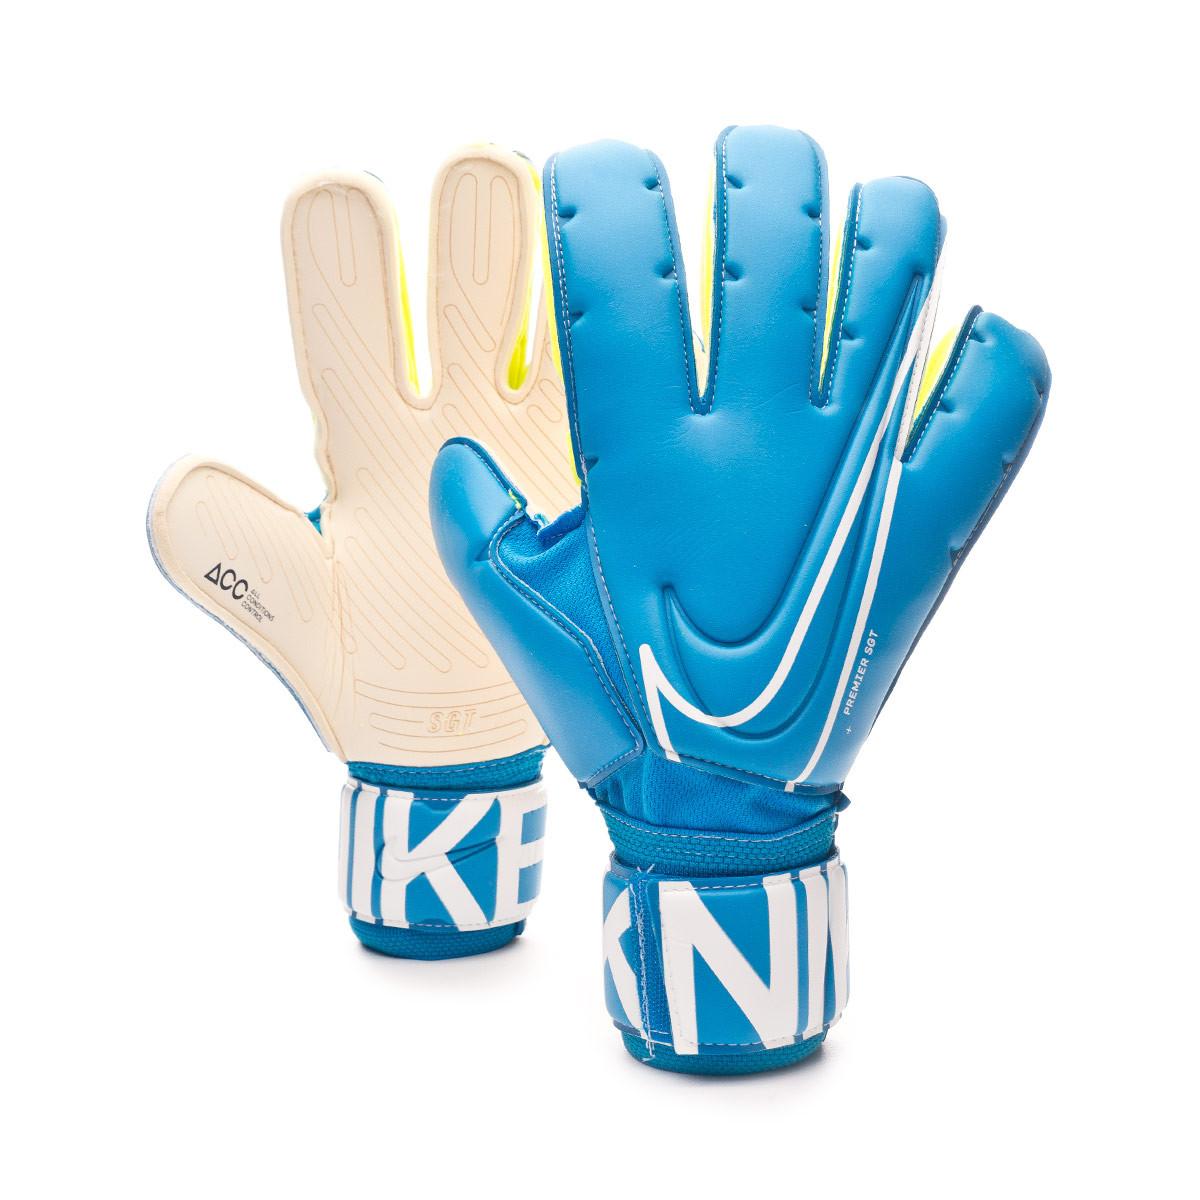 Tío o señor quemar Zapatos  Glove Nike Premier SGT Blue hero-White - Football store Fútbol Emotion